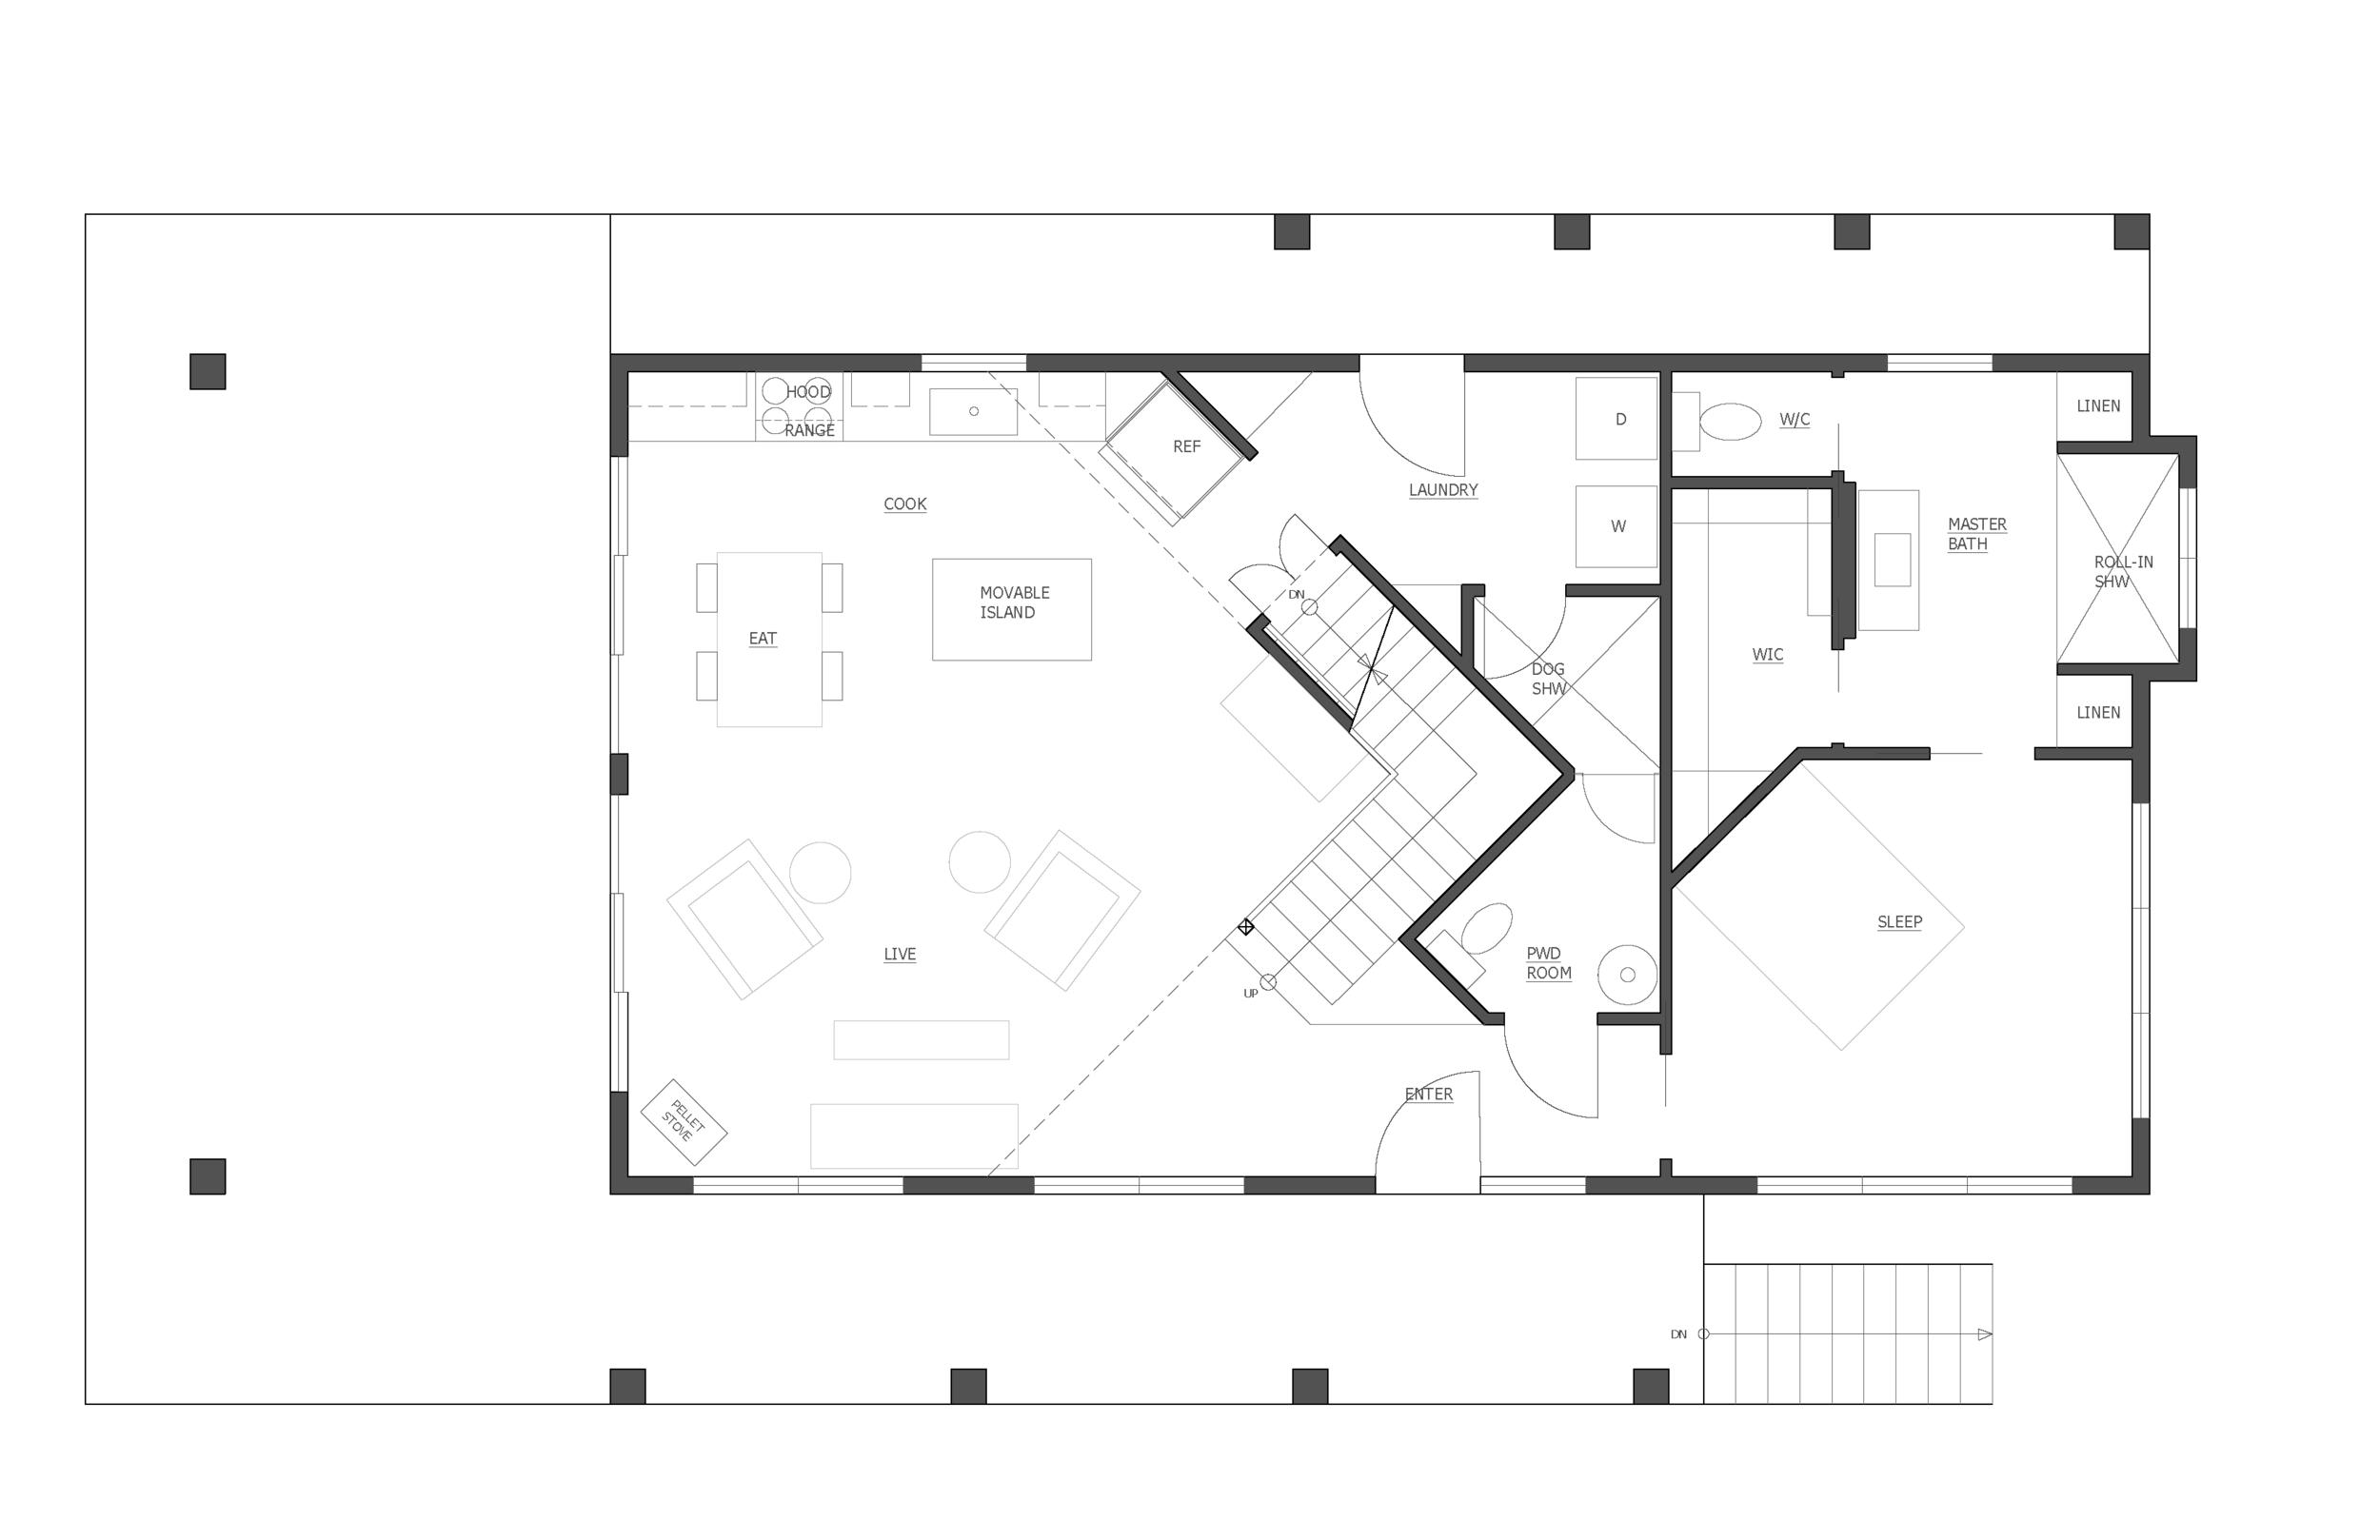 the main floor